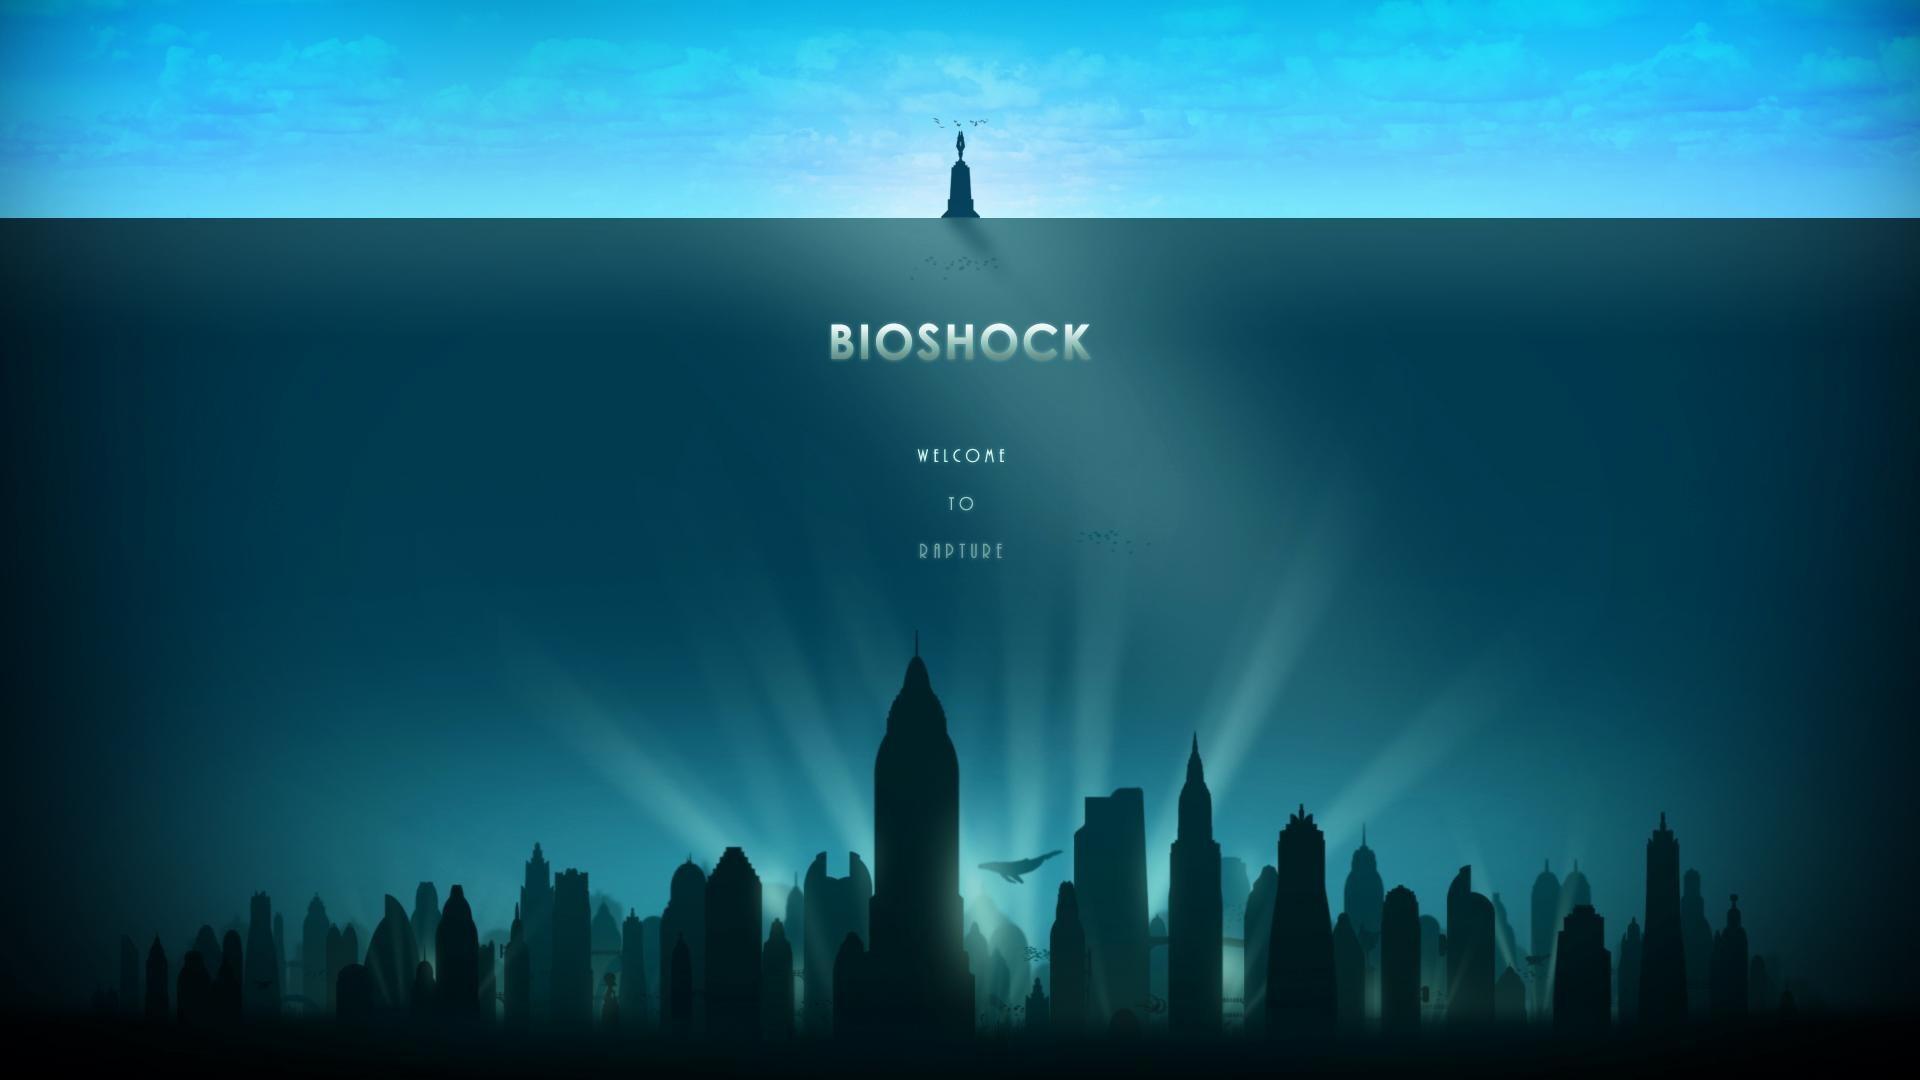 71 Bioshock Wallpapers on WallpaperPlay 1920x1080